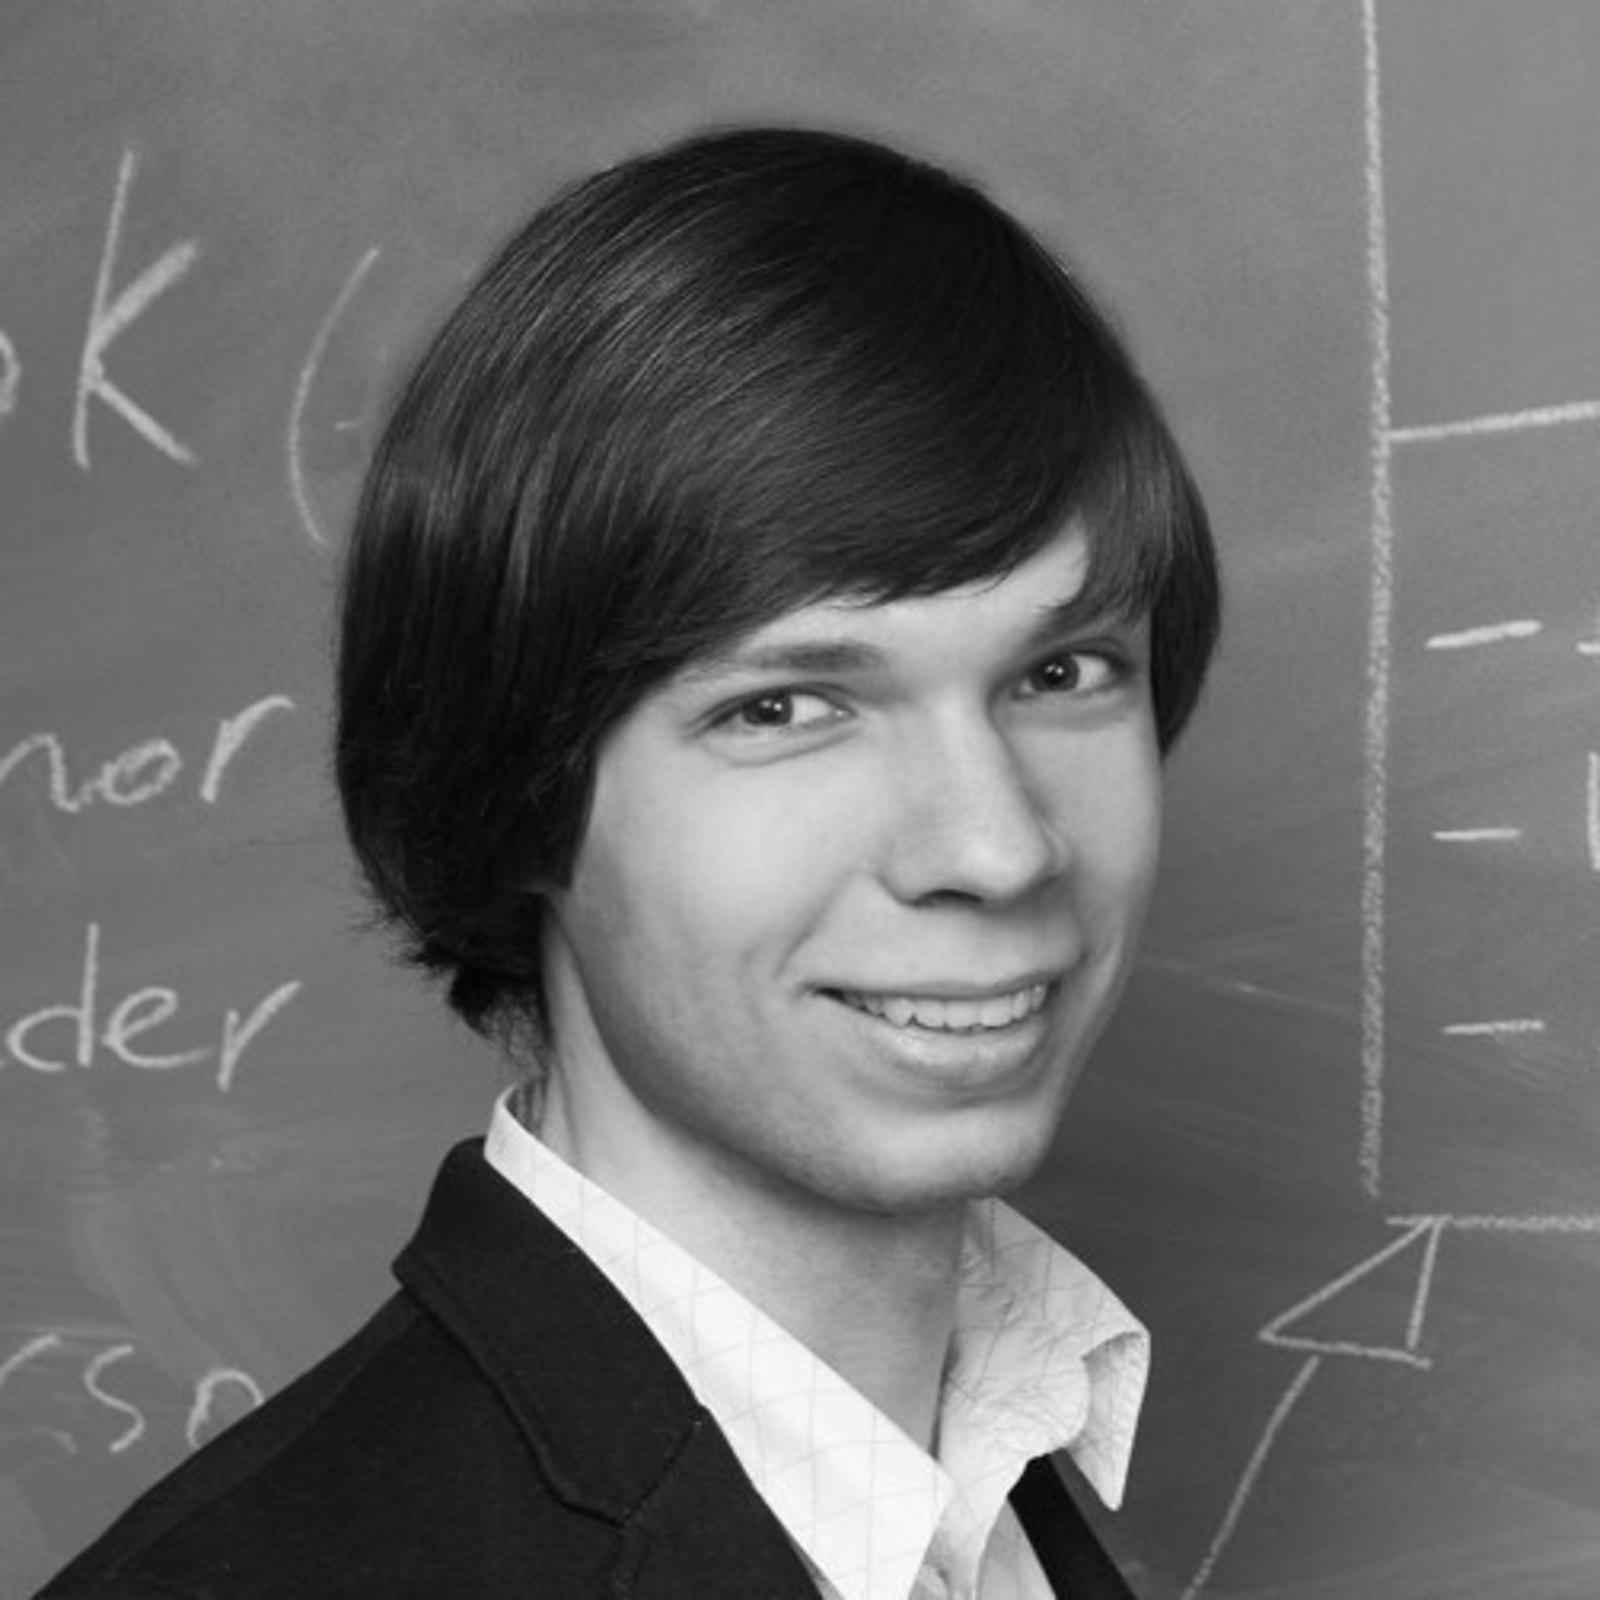 Portrait of Alexey Novakov